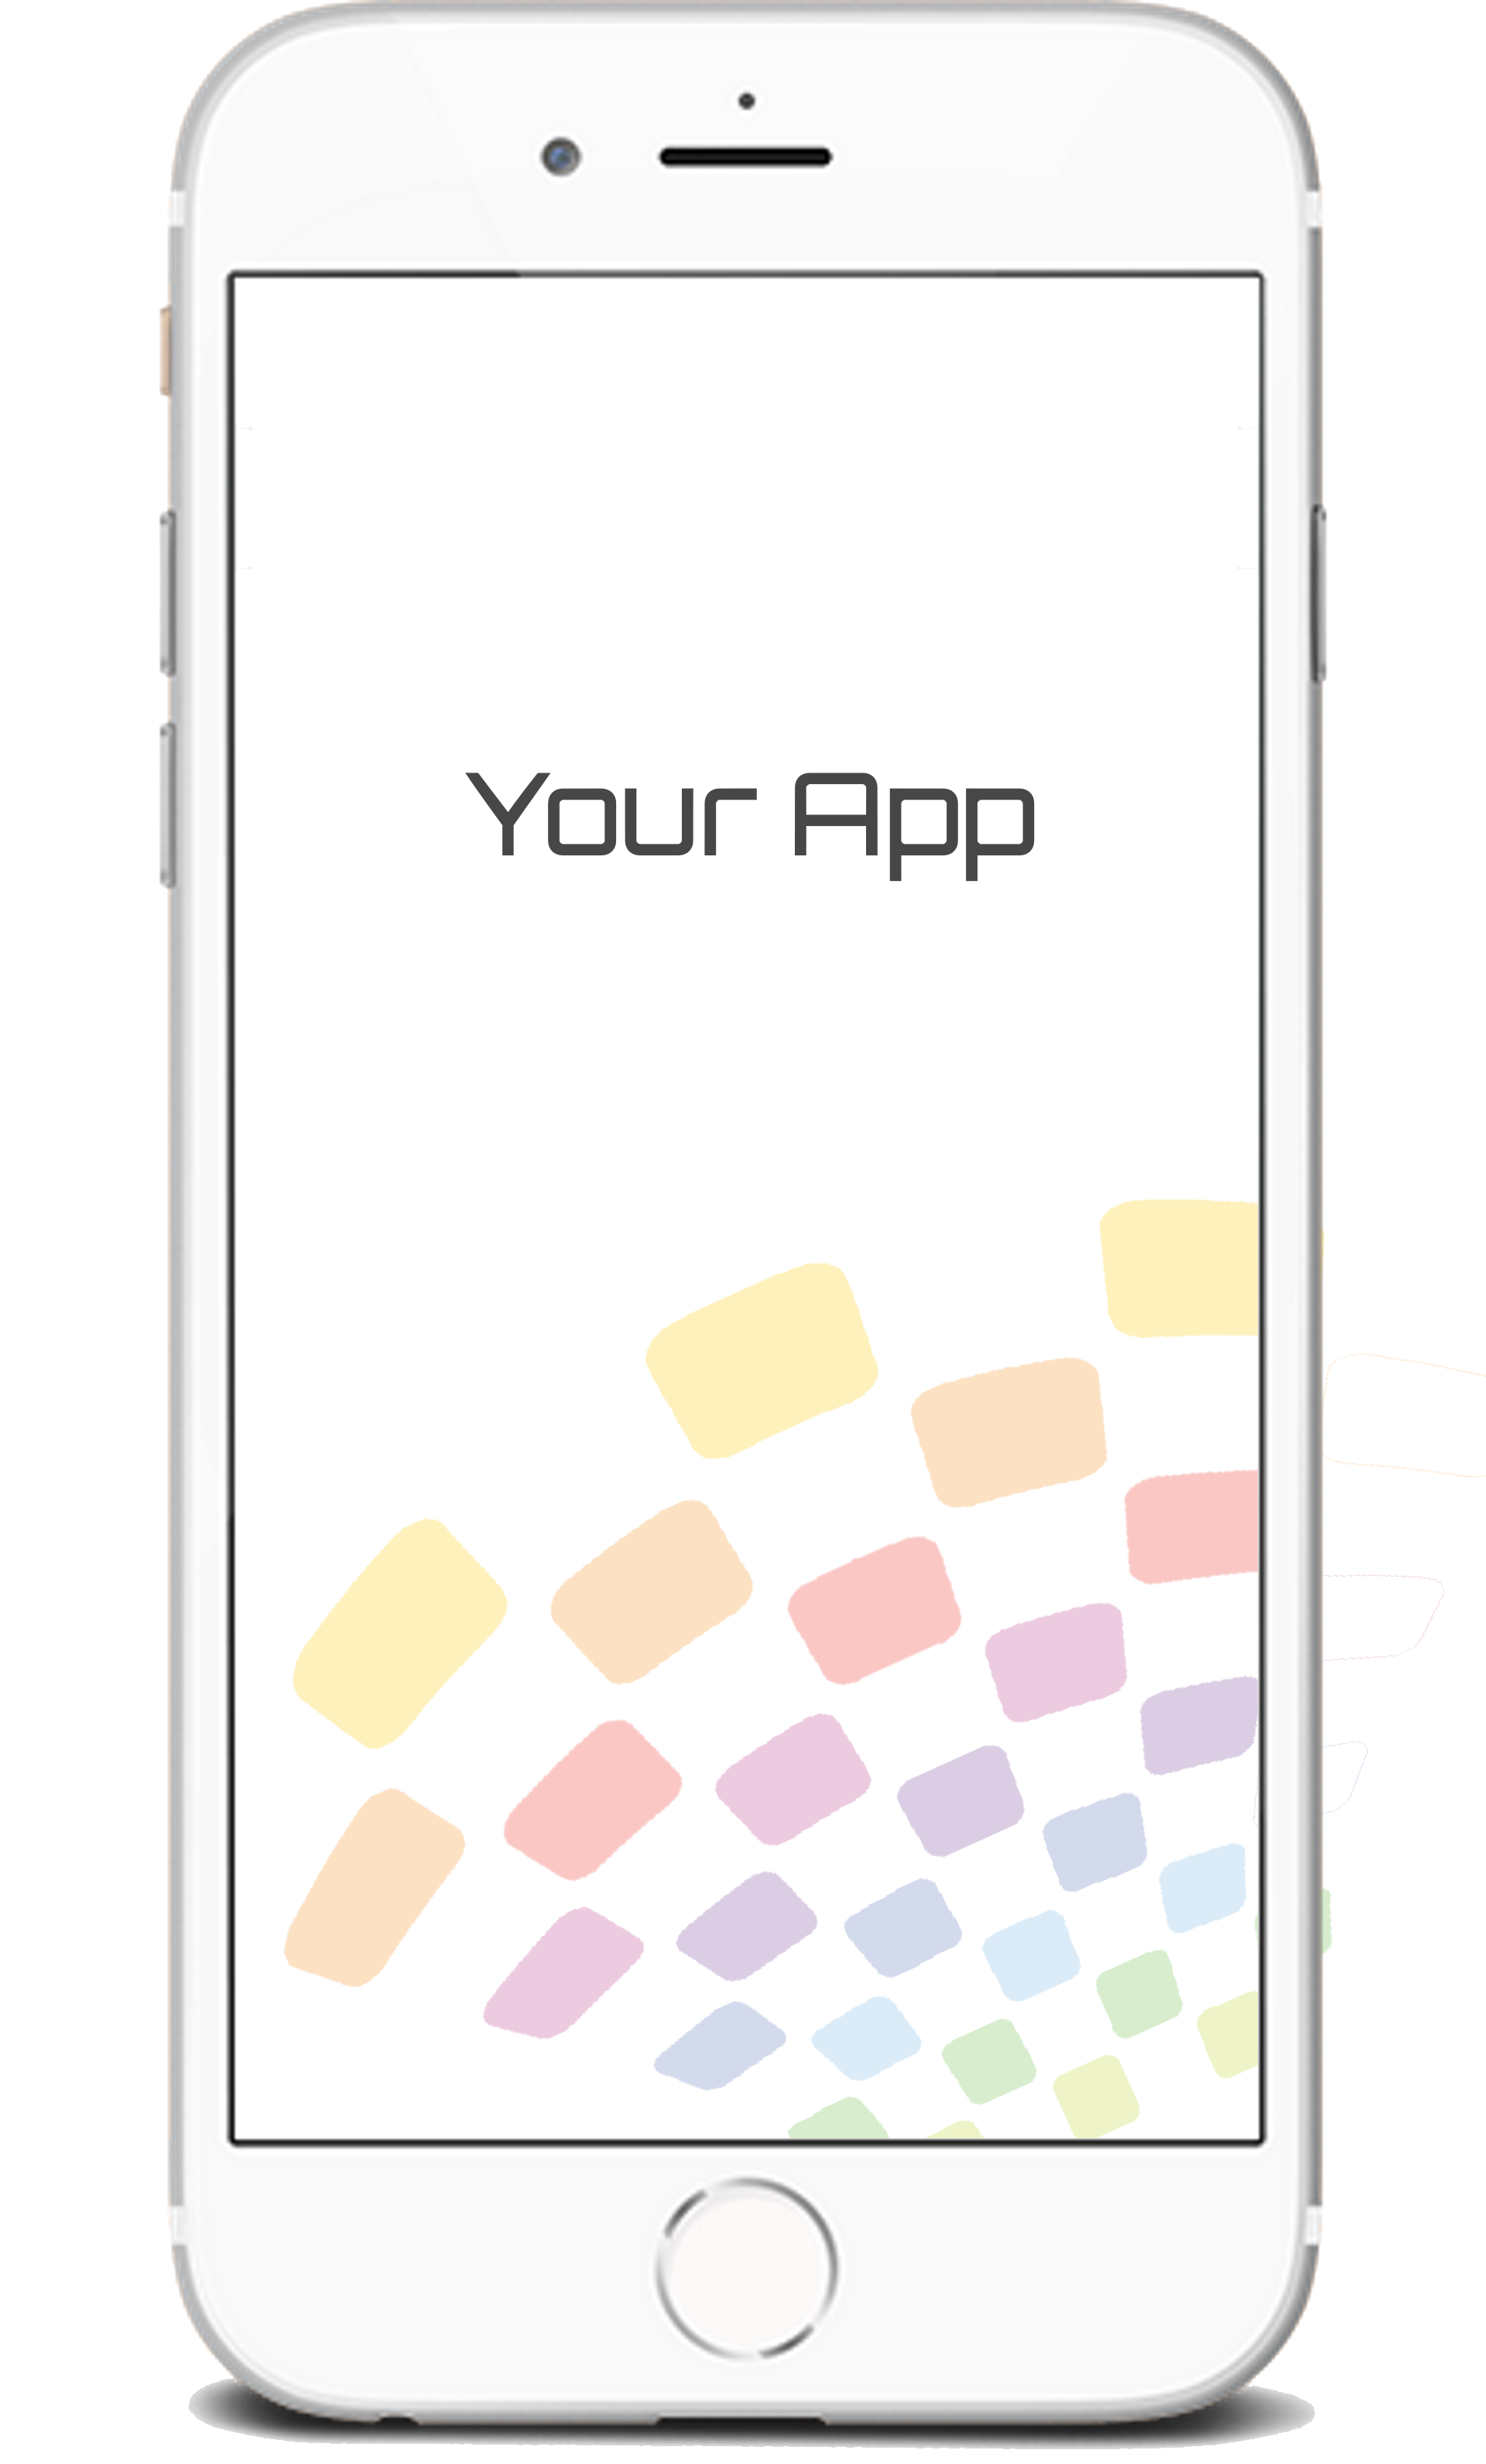 //azurichdev.com/wp-content/uploads/2018/05/iphone-1.png